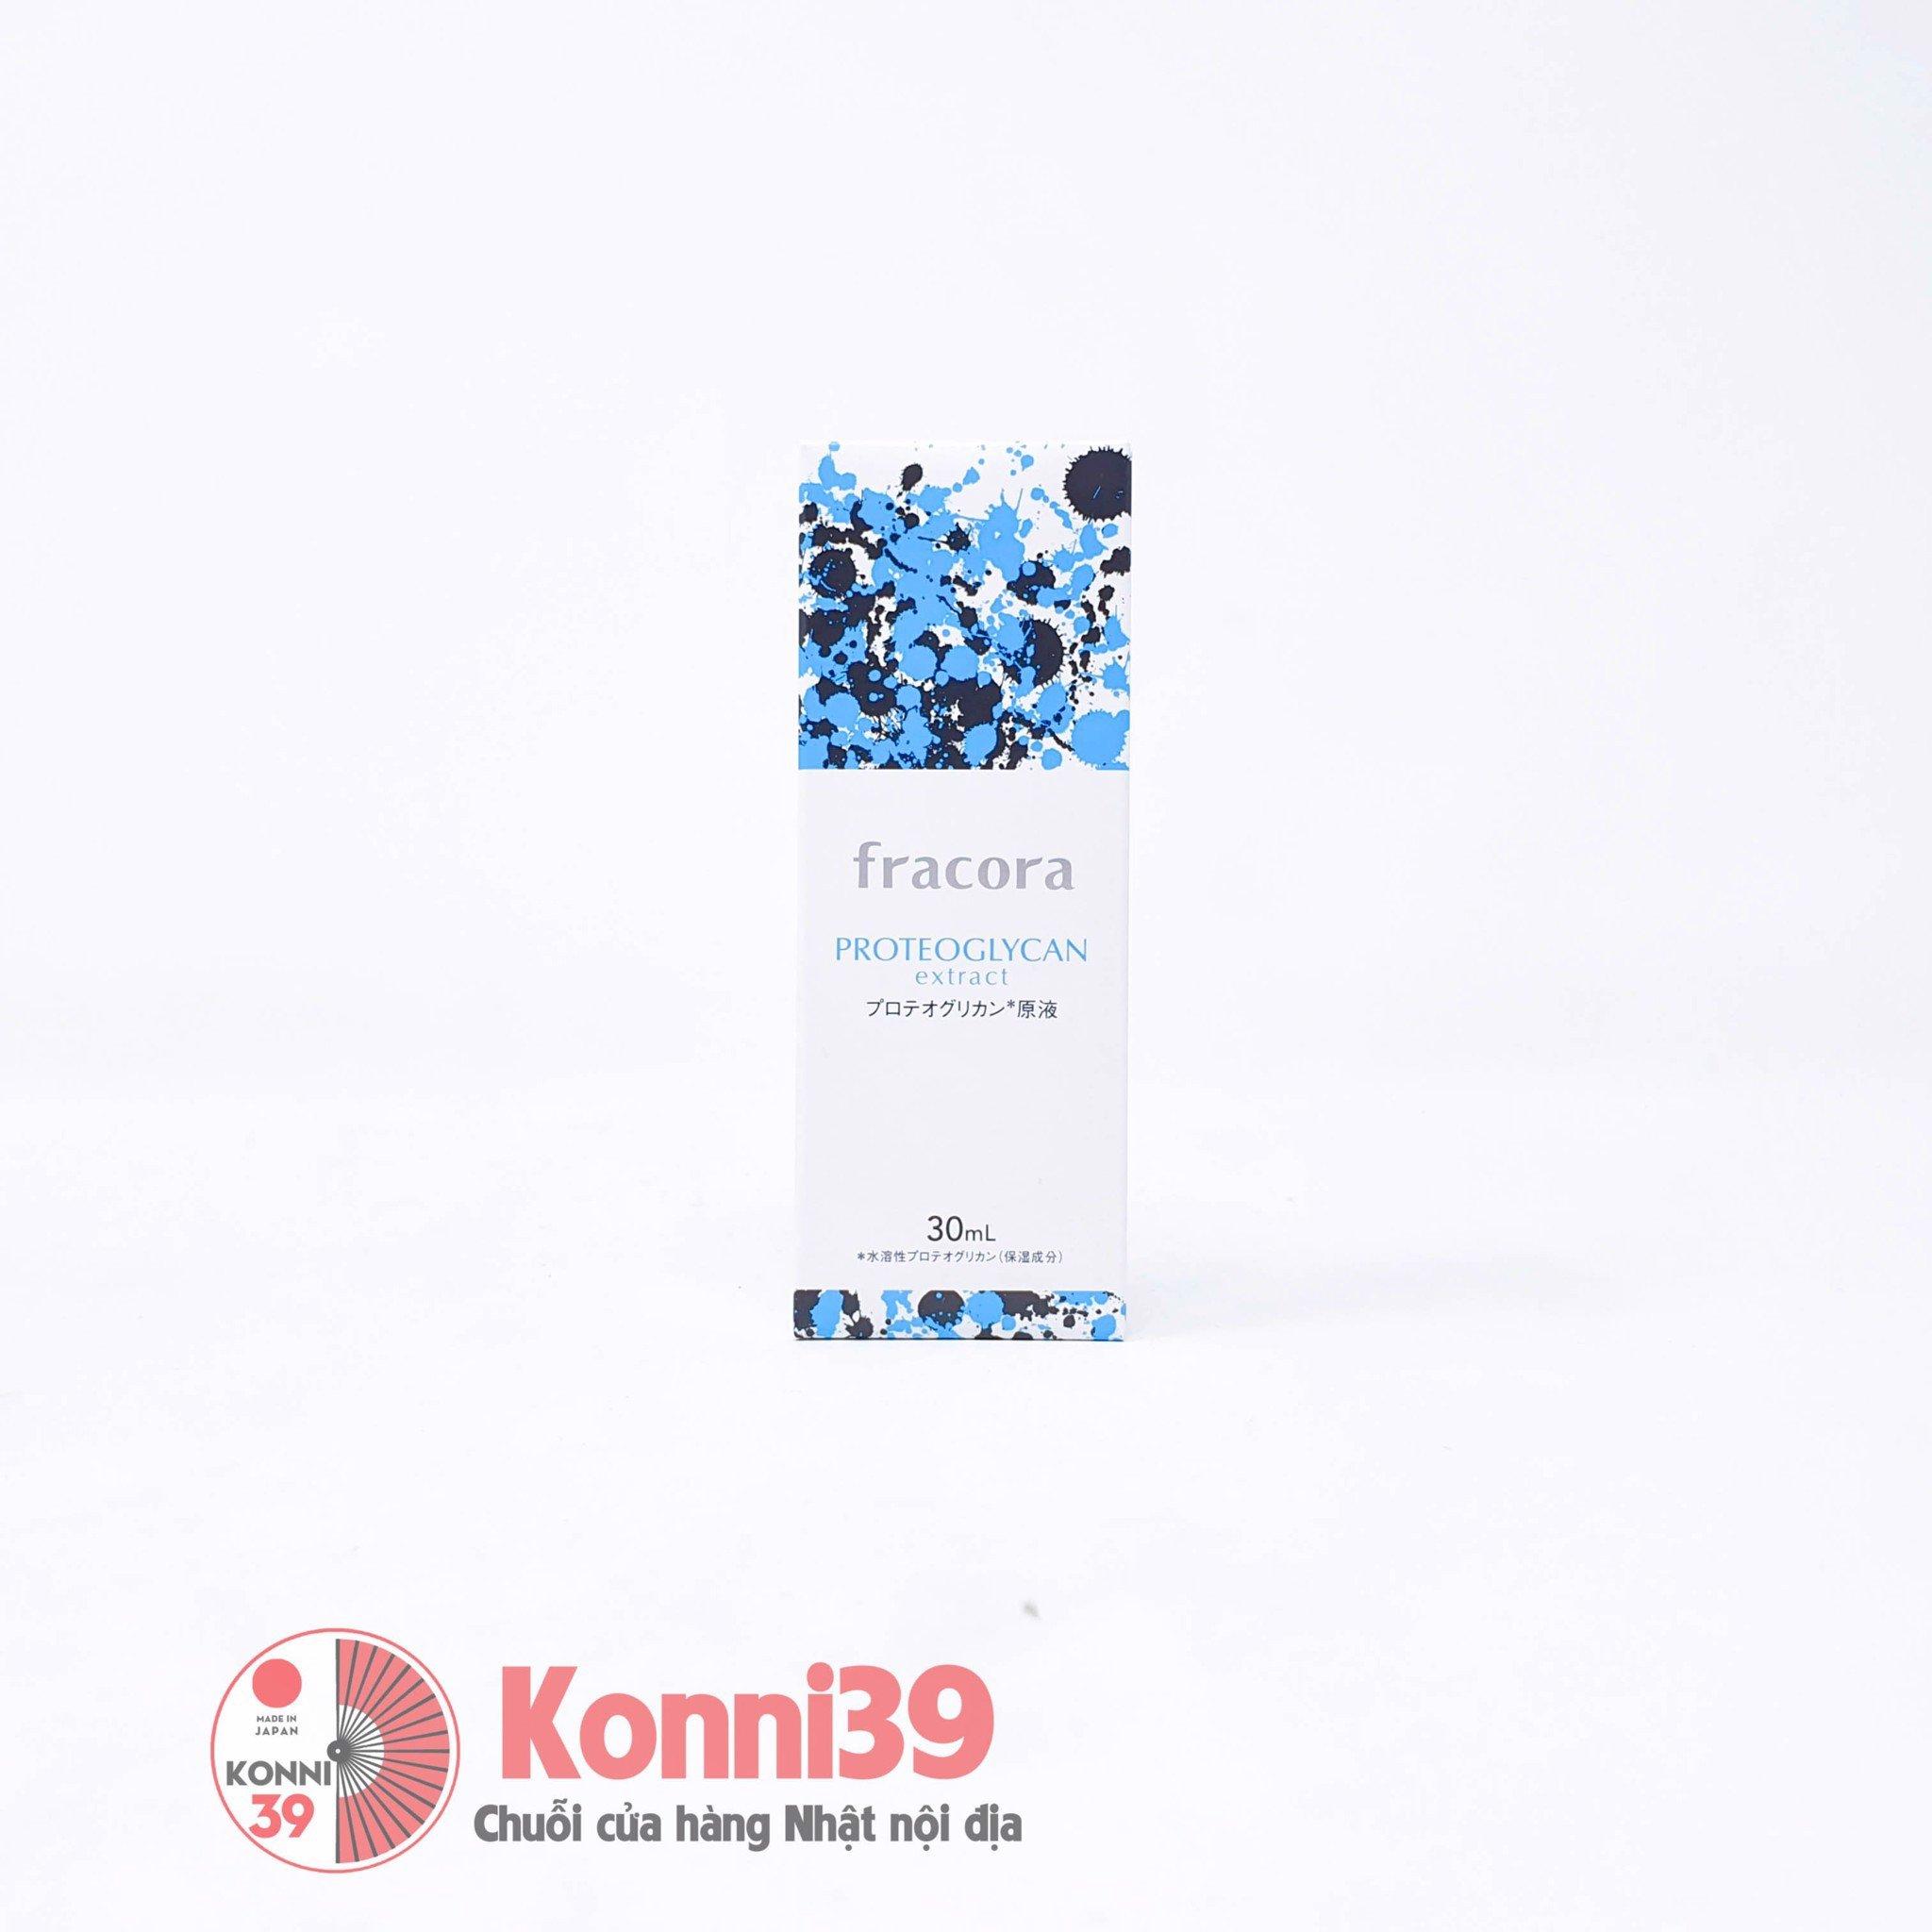 Tinh chất serum tái tạo da Proteoglycan Fracora LIFTest Extract 30ml